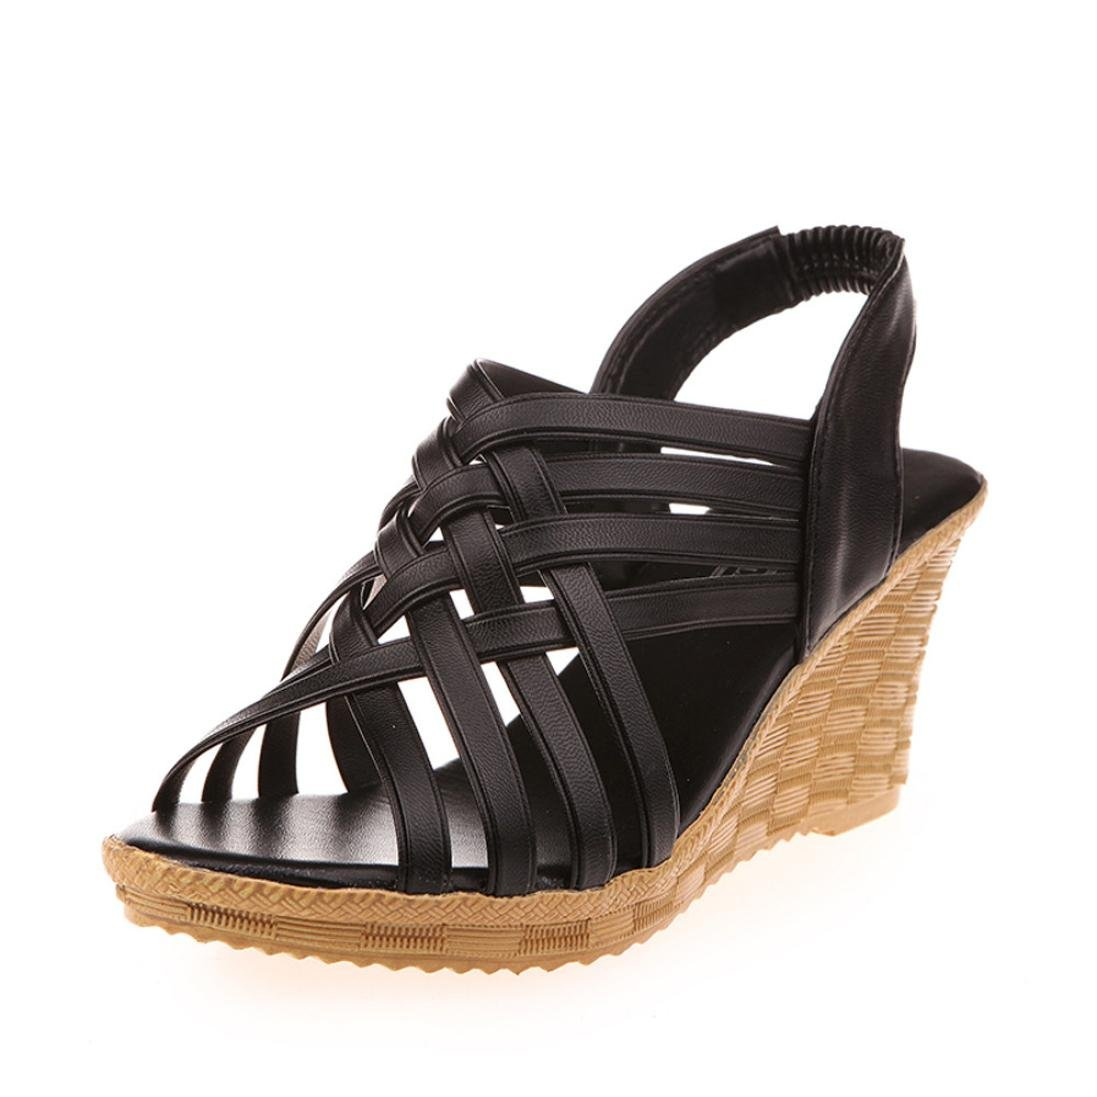 Kstare Women's Sandals,Woman High Platforms Cut Outs Pattern Checkered Belt Wedge Sandal Peep-Toe Shoes B078S6QDRQ 4.5 B(M) US|Black